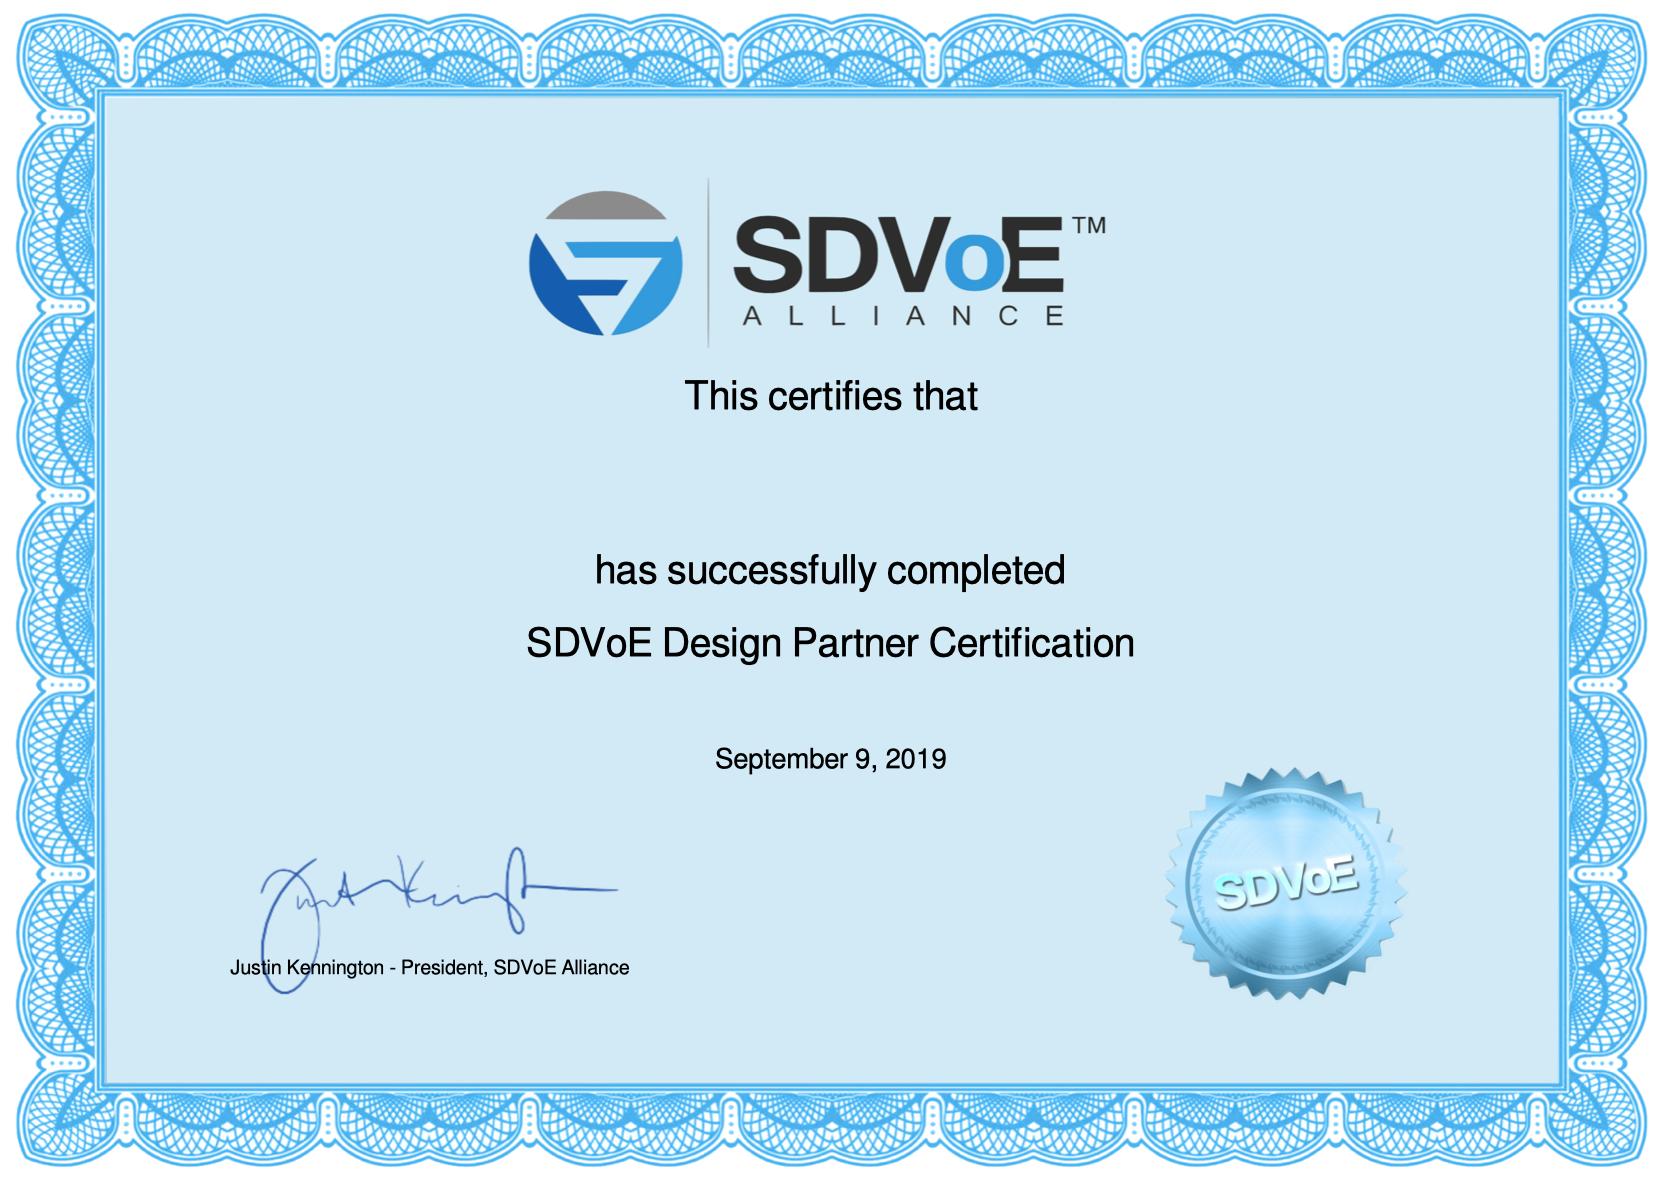 SDVoE Design Partner Certification China